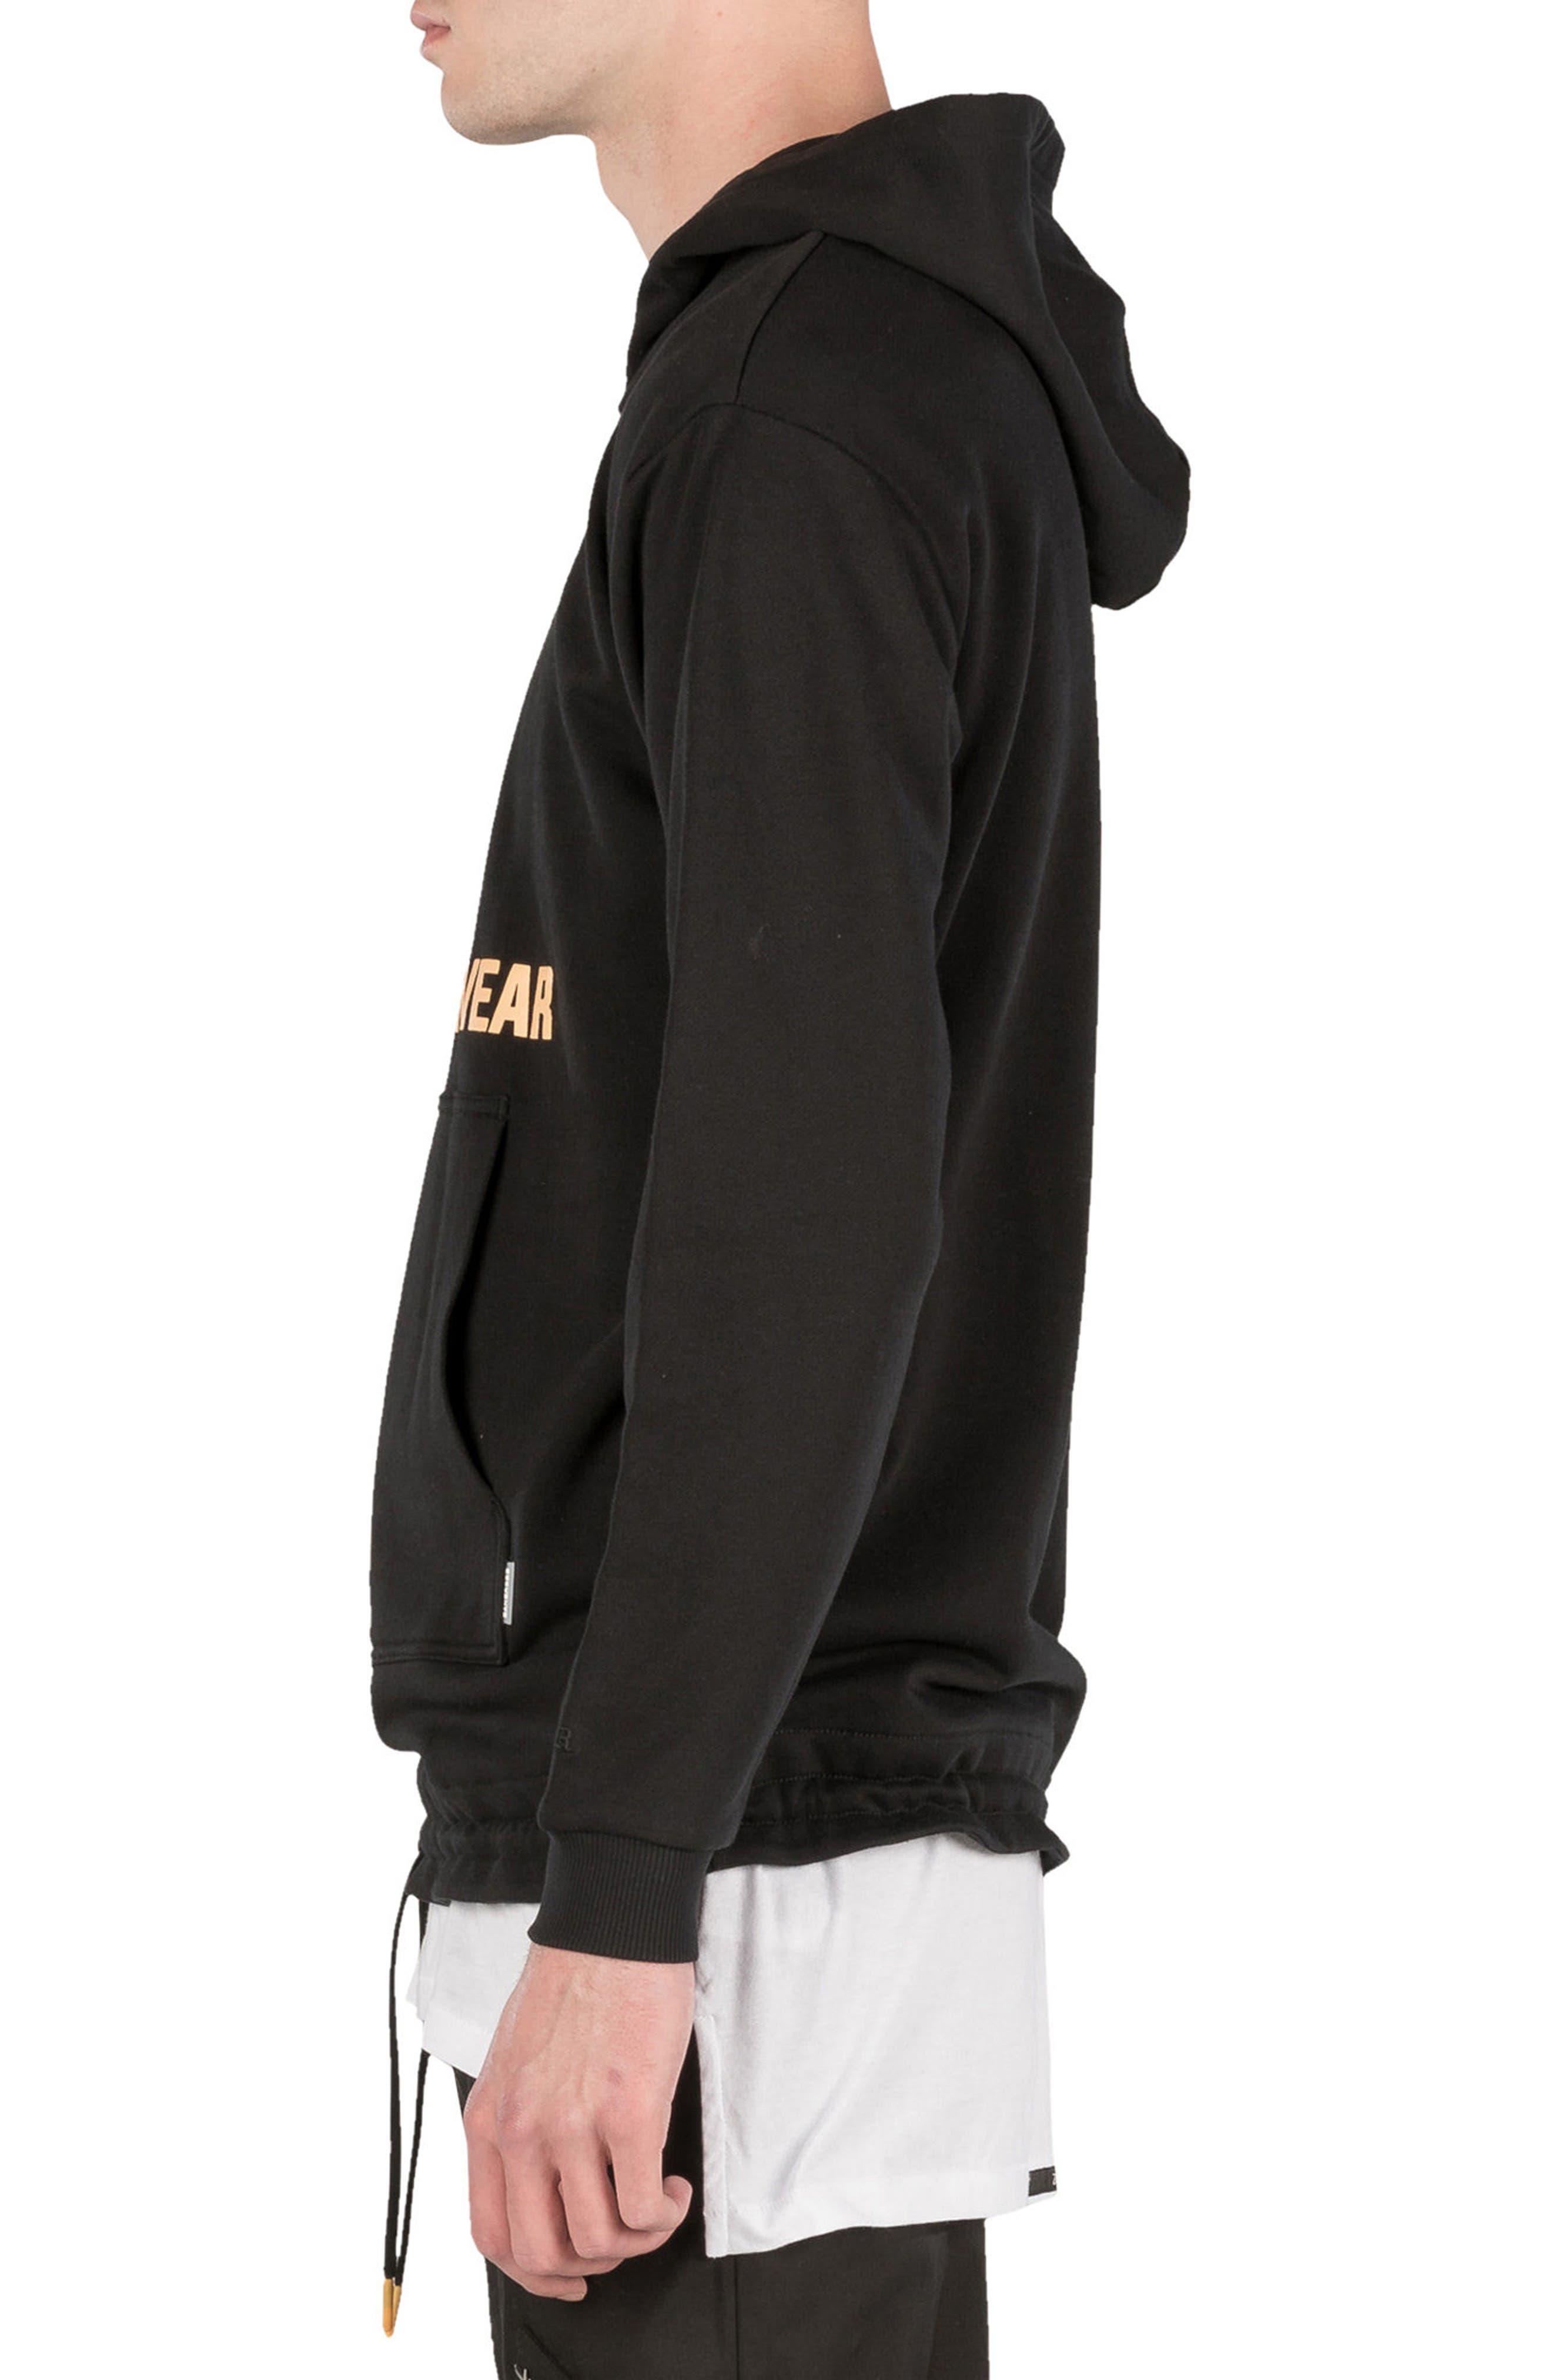 Teamwear Box Hoodie Sweatshirt,                             Alternate thumbnail 3, color,                             Black